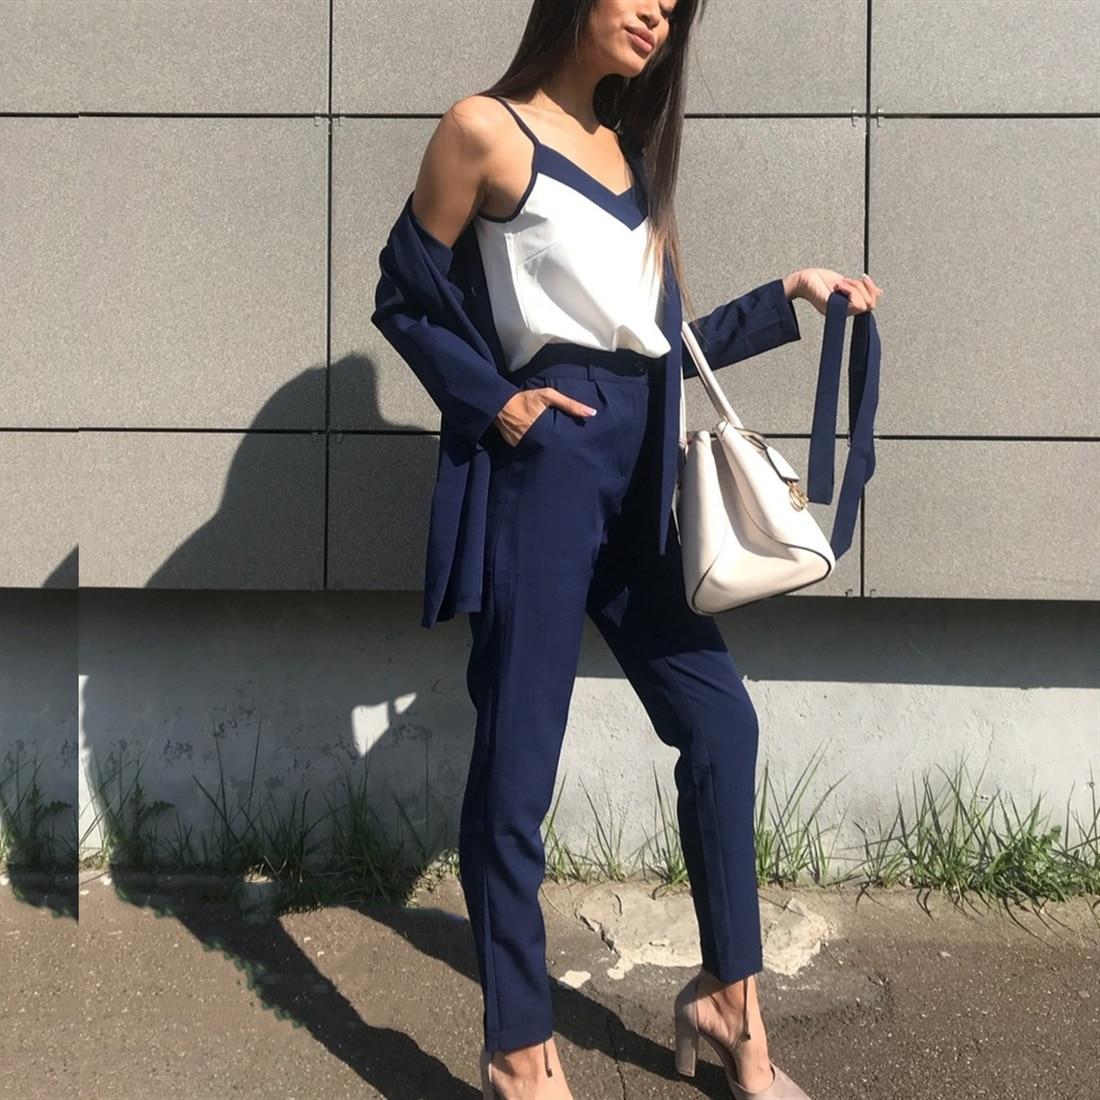 Taotrees Pants Suit V Neck Buttonless Bracelet Sleeves Blazer Jacket &Strap Vest &Full Length Pant 3 Piece Set OL Style